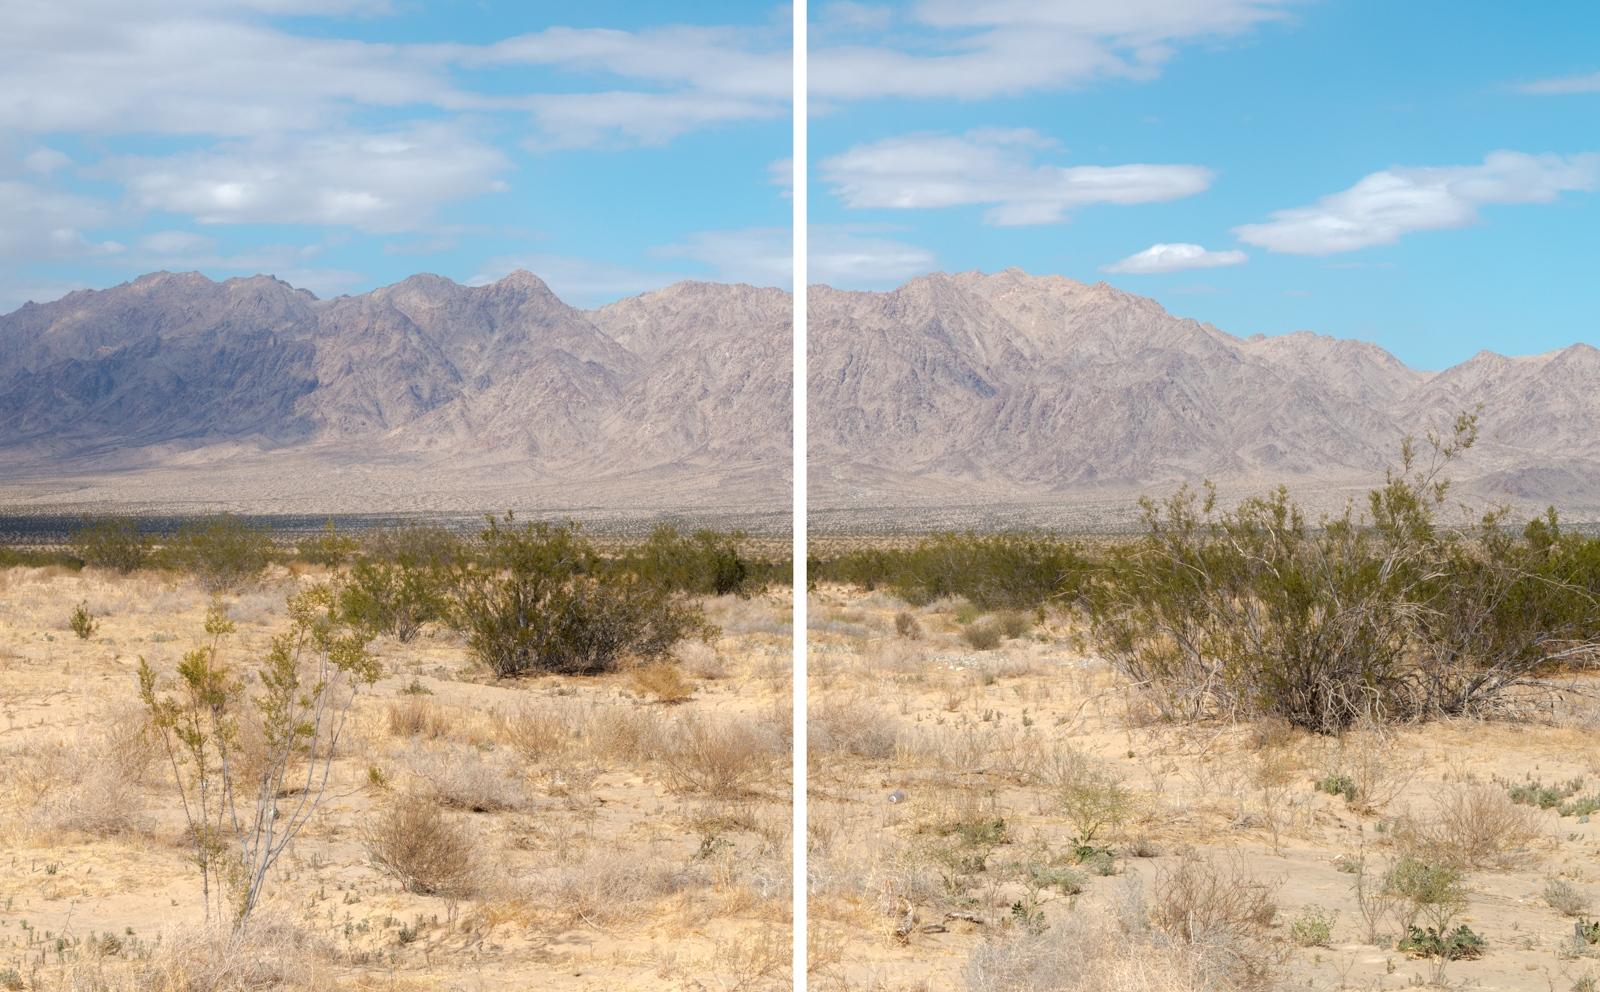 Art and Documentary Photography - Loading 2xcreosotelandscape-2.jpg